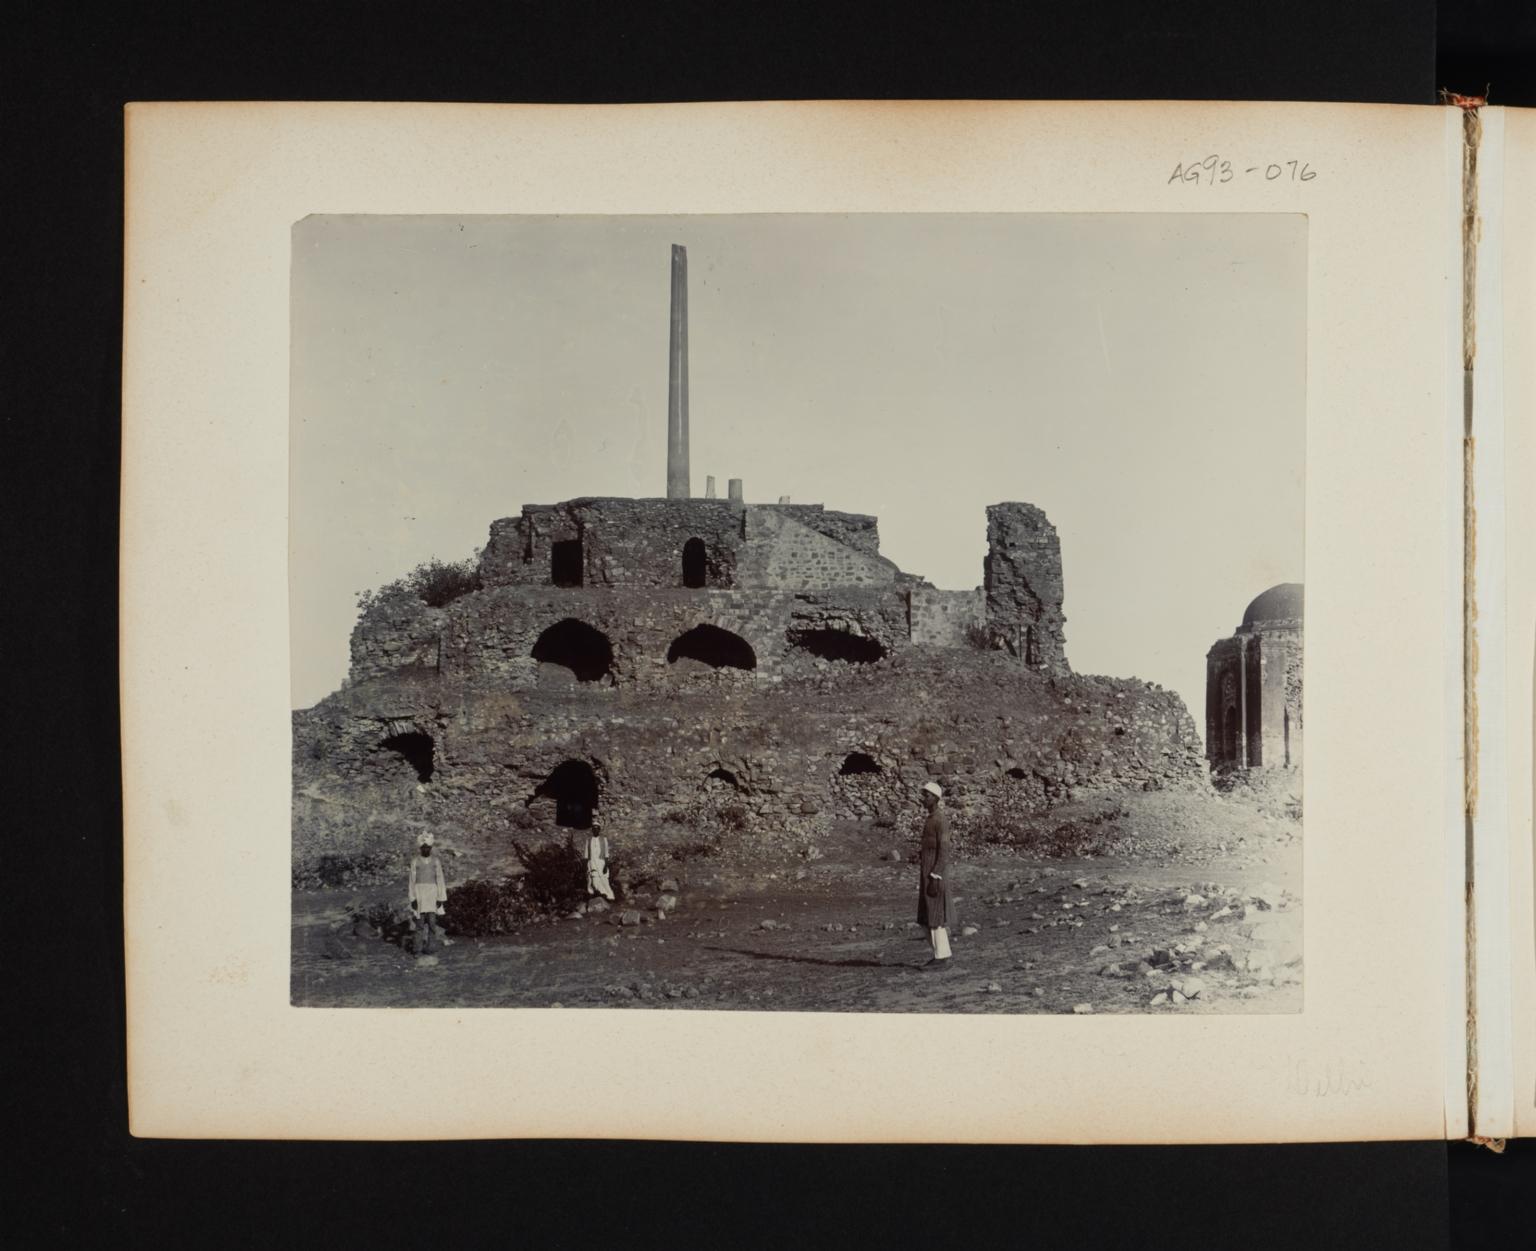 Building ruins in Delhi, India.